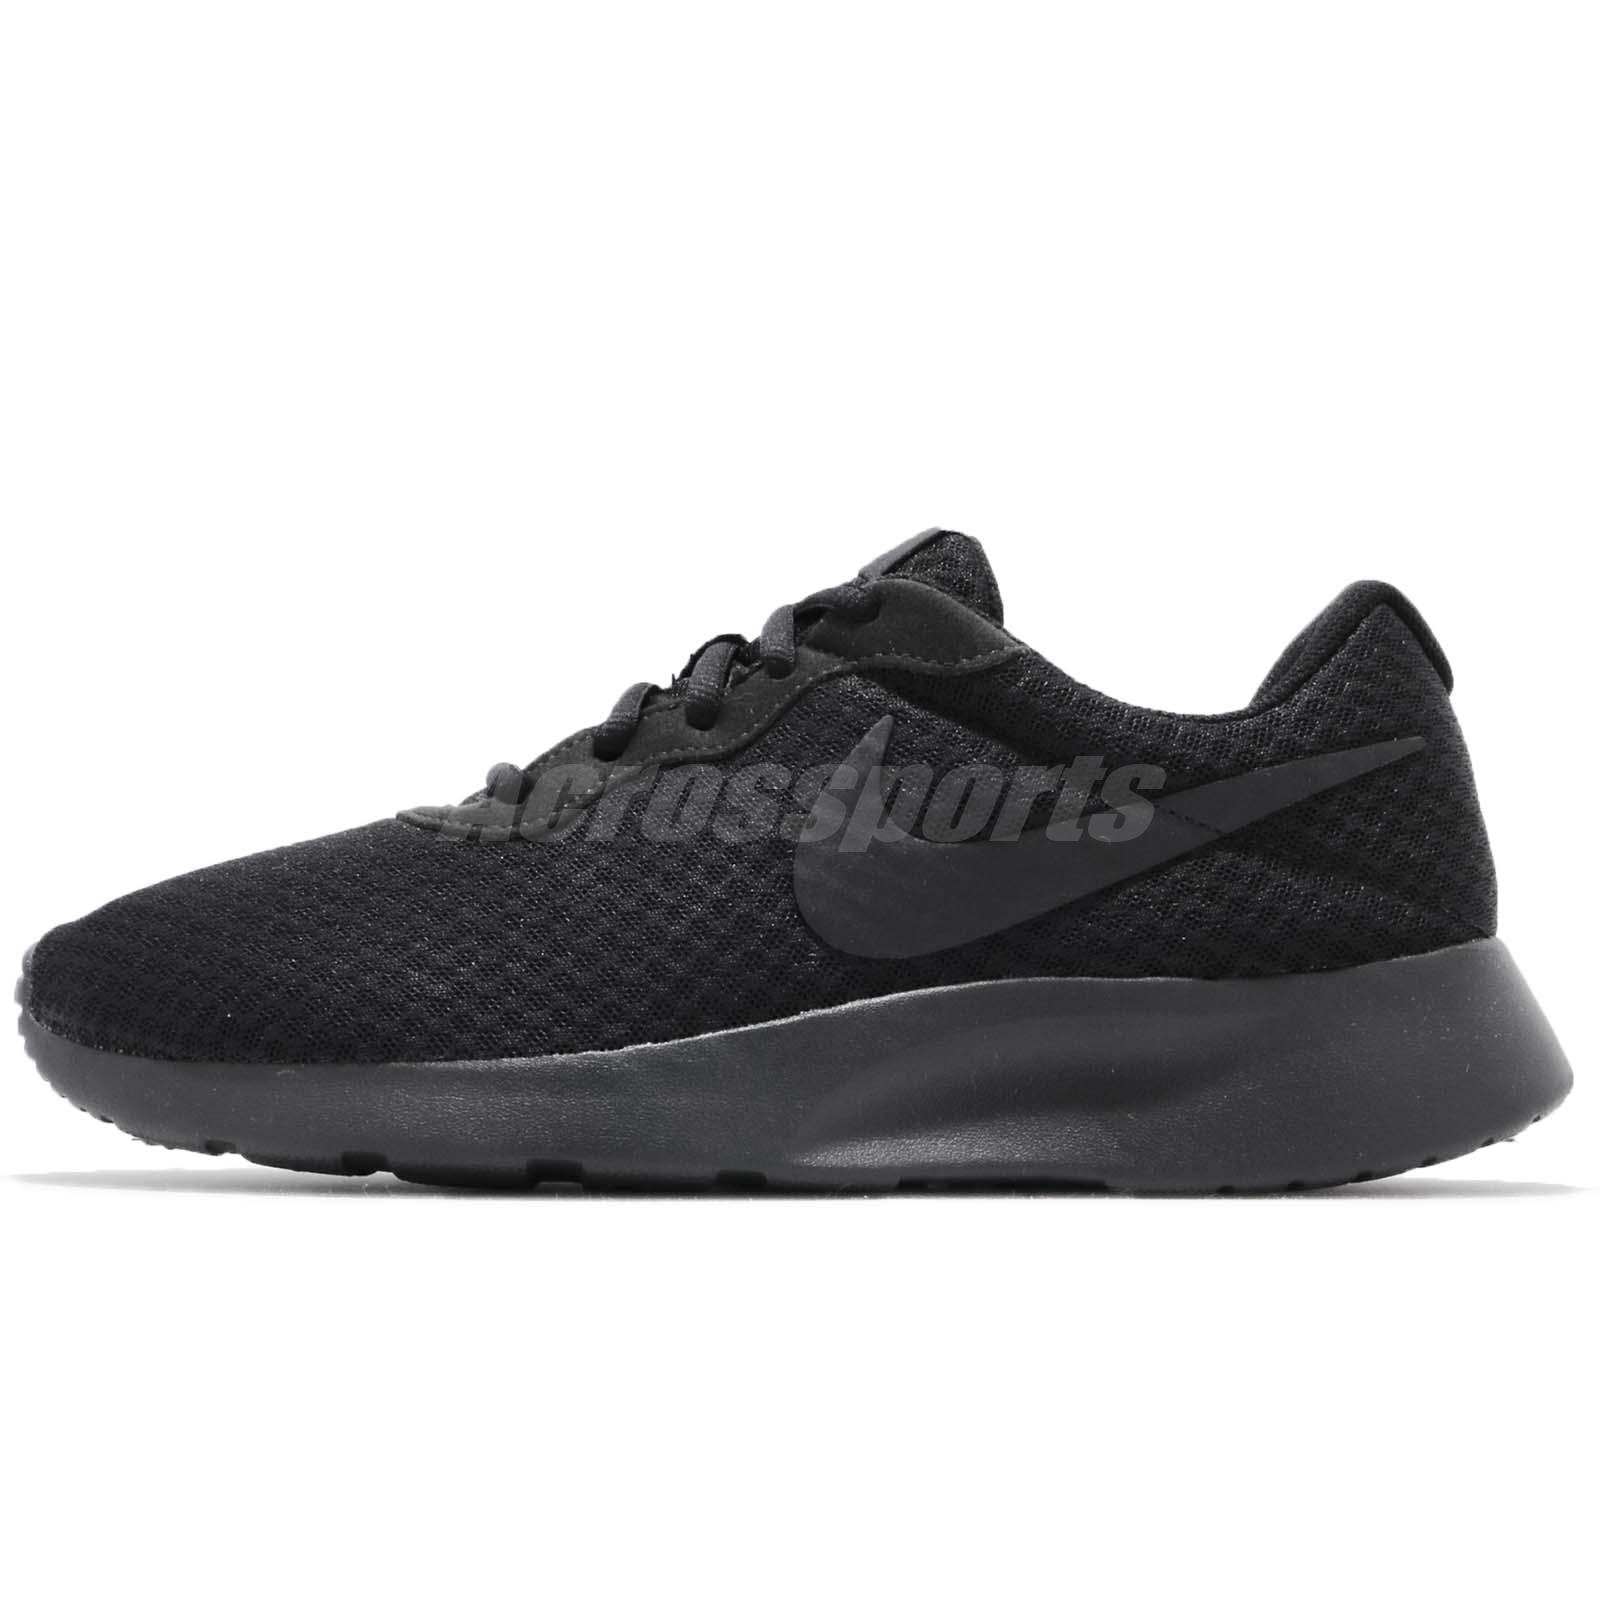 Nike Tanjun Black Anthracite Mens Casual Shoes Sneakers 812654-001 ... ceeb10c03e2dc